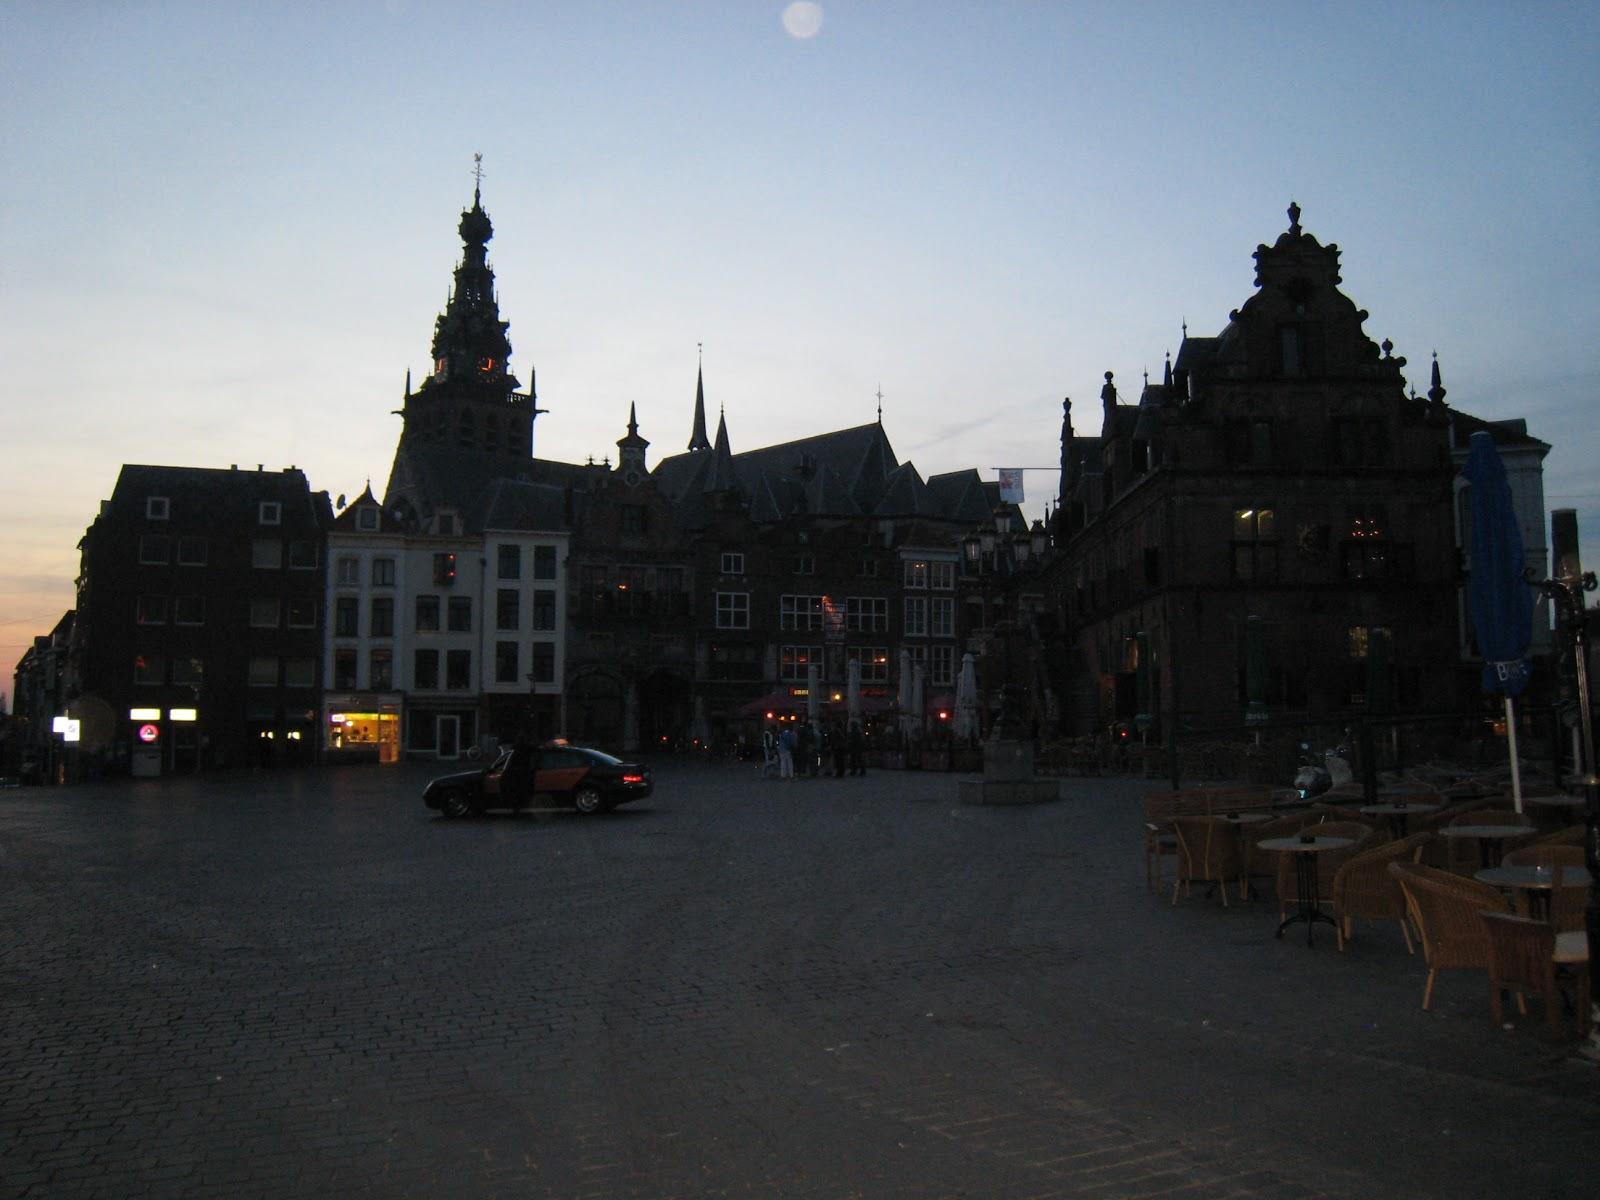 Nijmegen Netherlands  city pictures gallery : Black Swamp Cornucopia: A trip to Nijmegen, the Netherlands